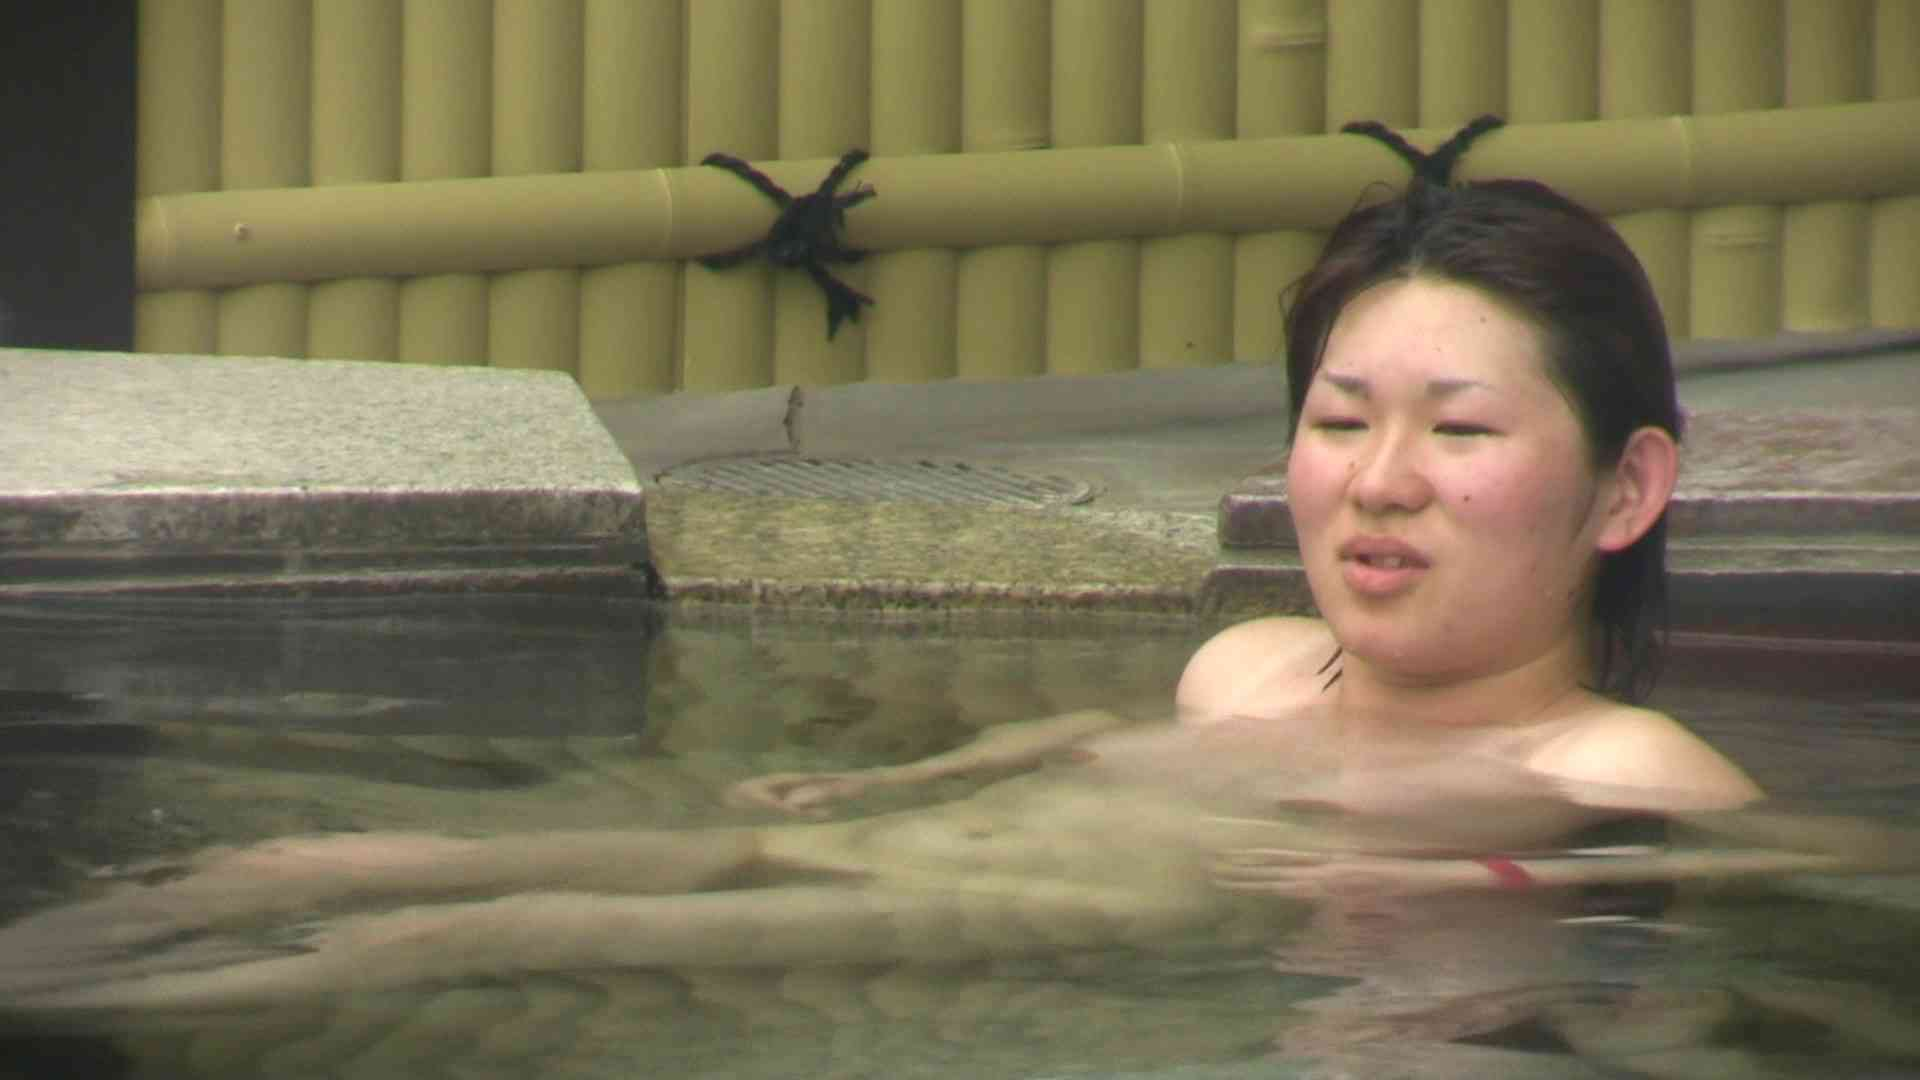 Aquaな露天風呂Vol.673 露天風呂 | OLのエロ生活  45連発 40